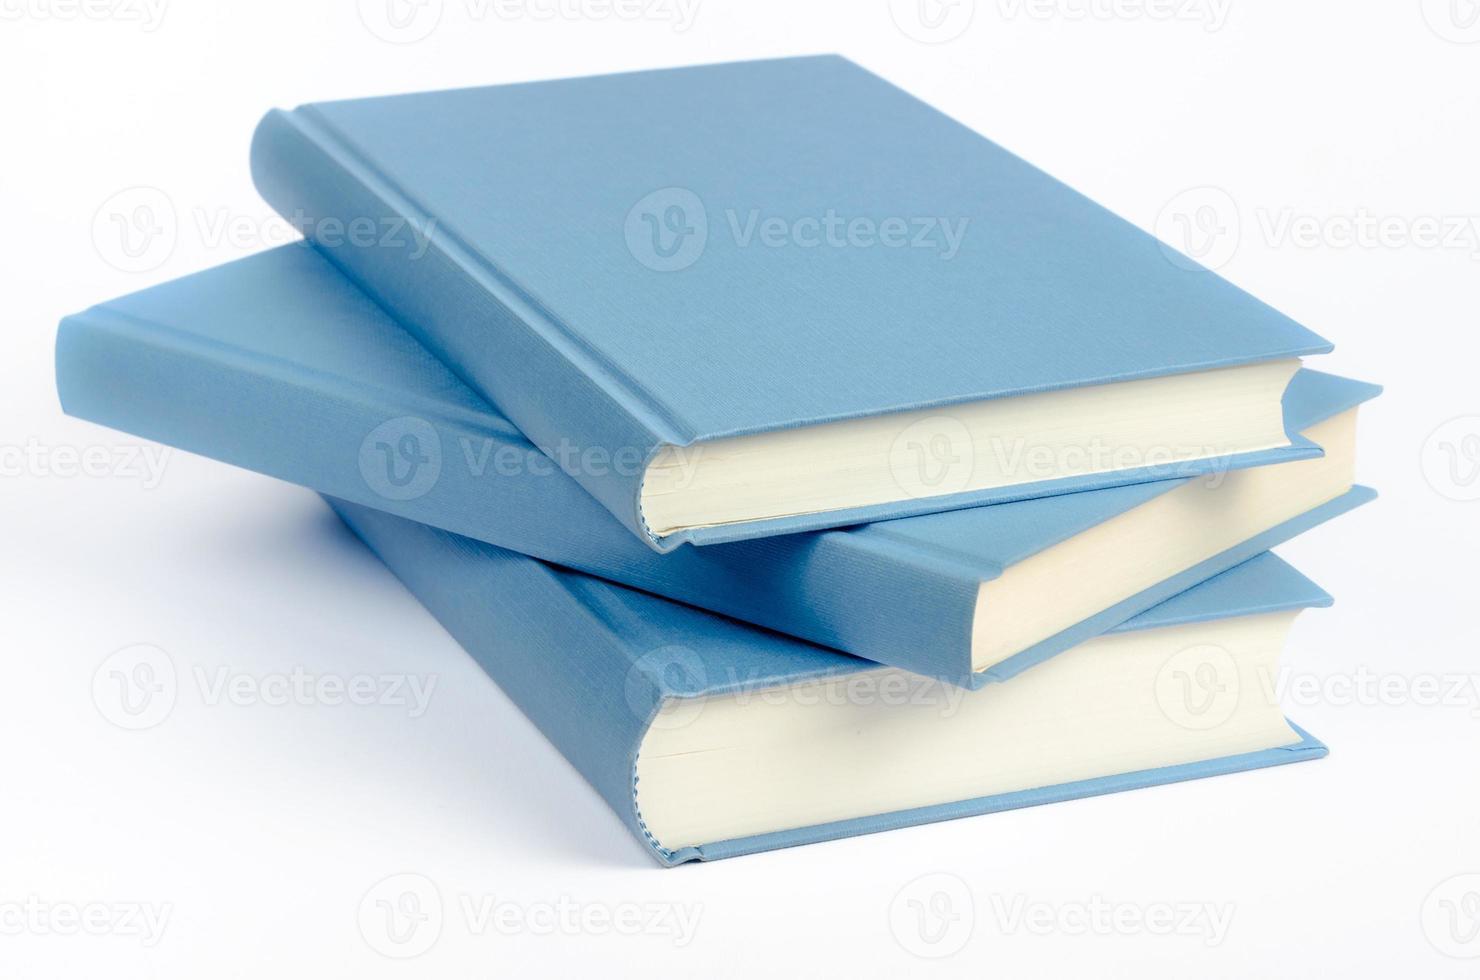 Three blue books on a white background photo